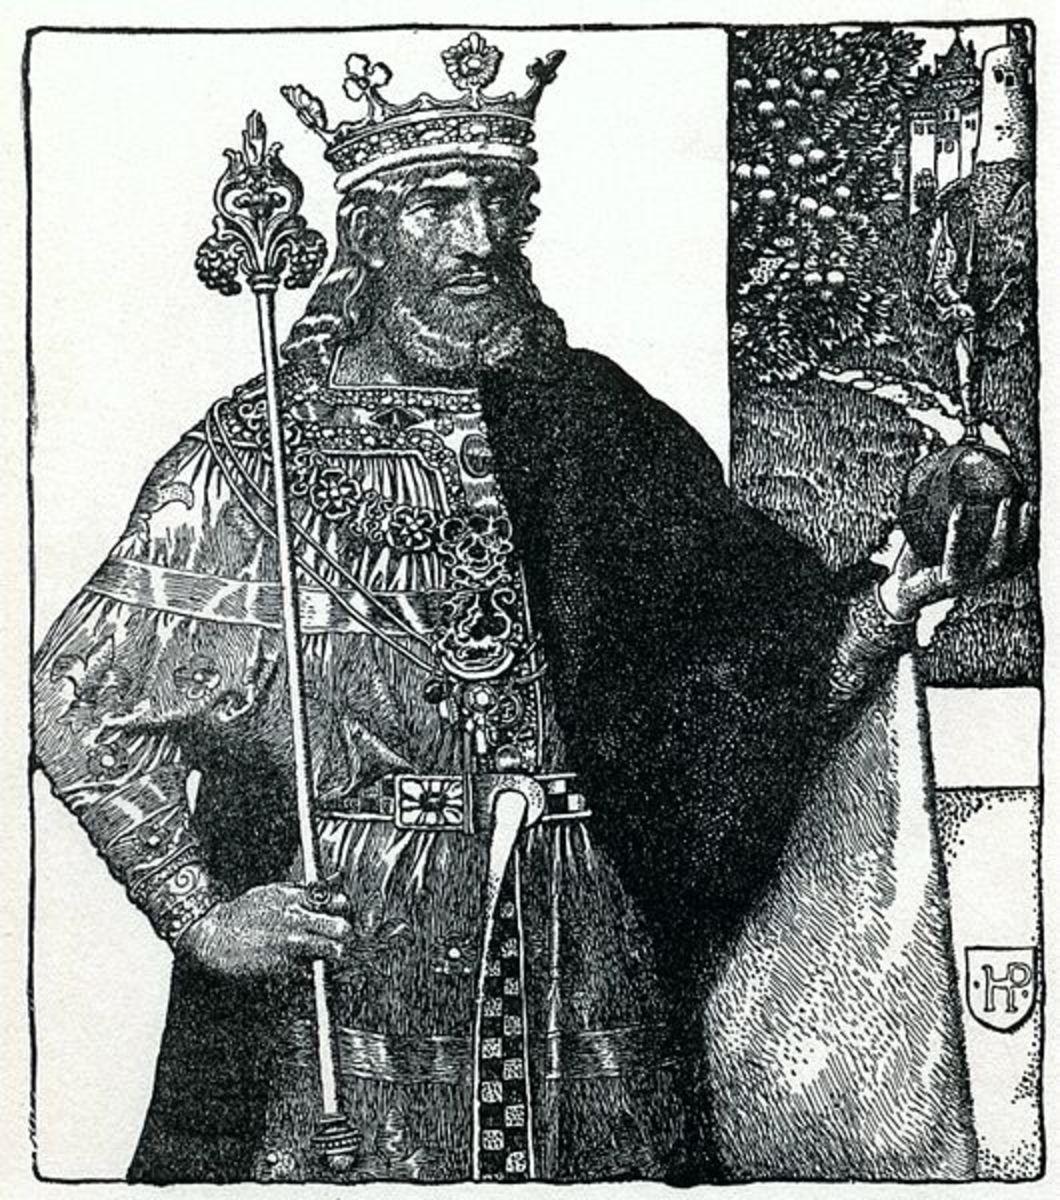 Sketch of good King Arthur.